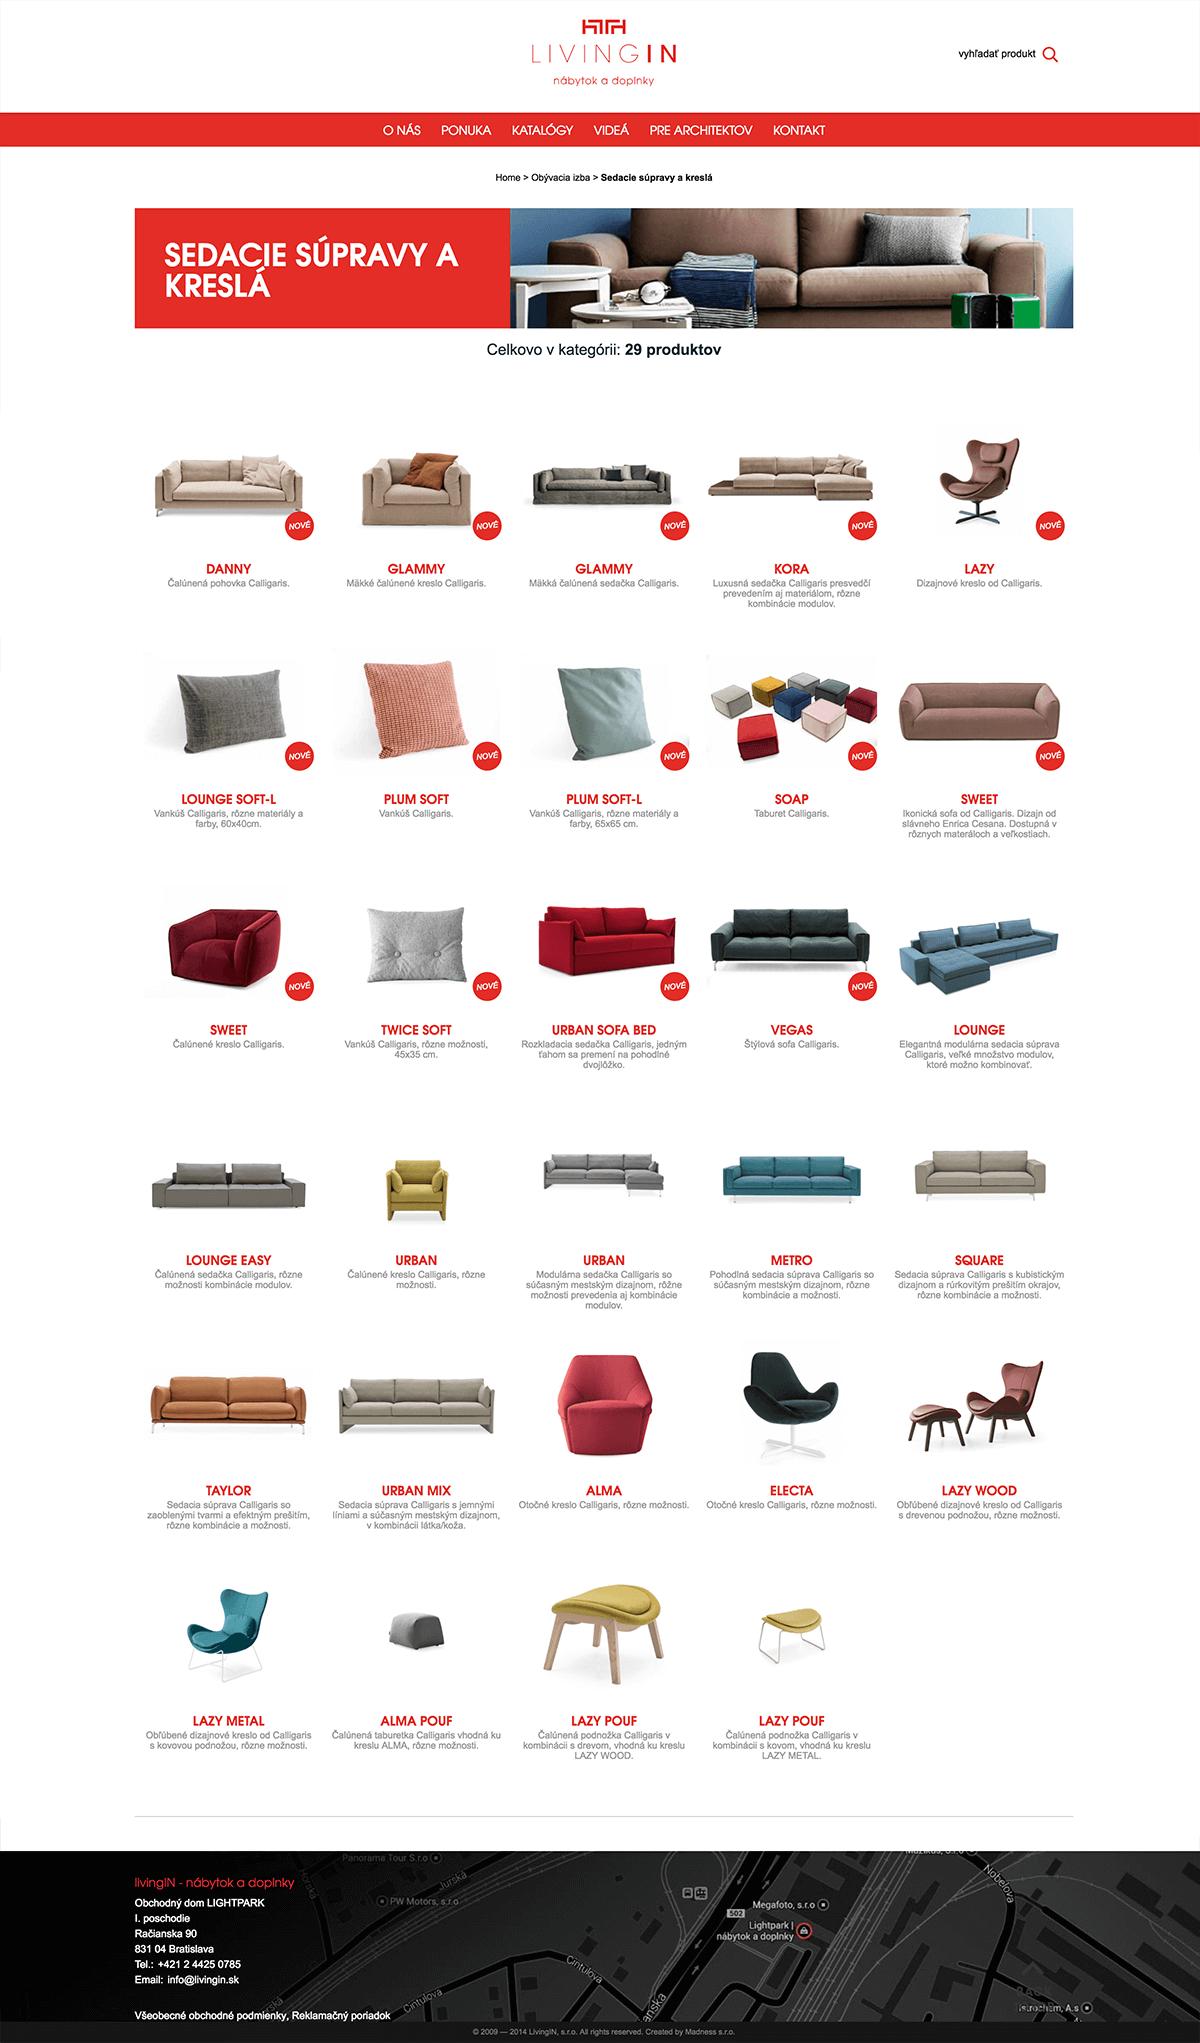 livingin-product-categories-sedacie-supravy-a-kresla